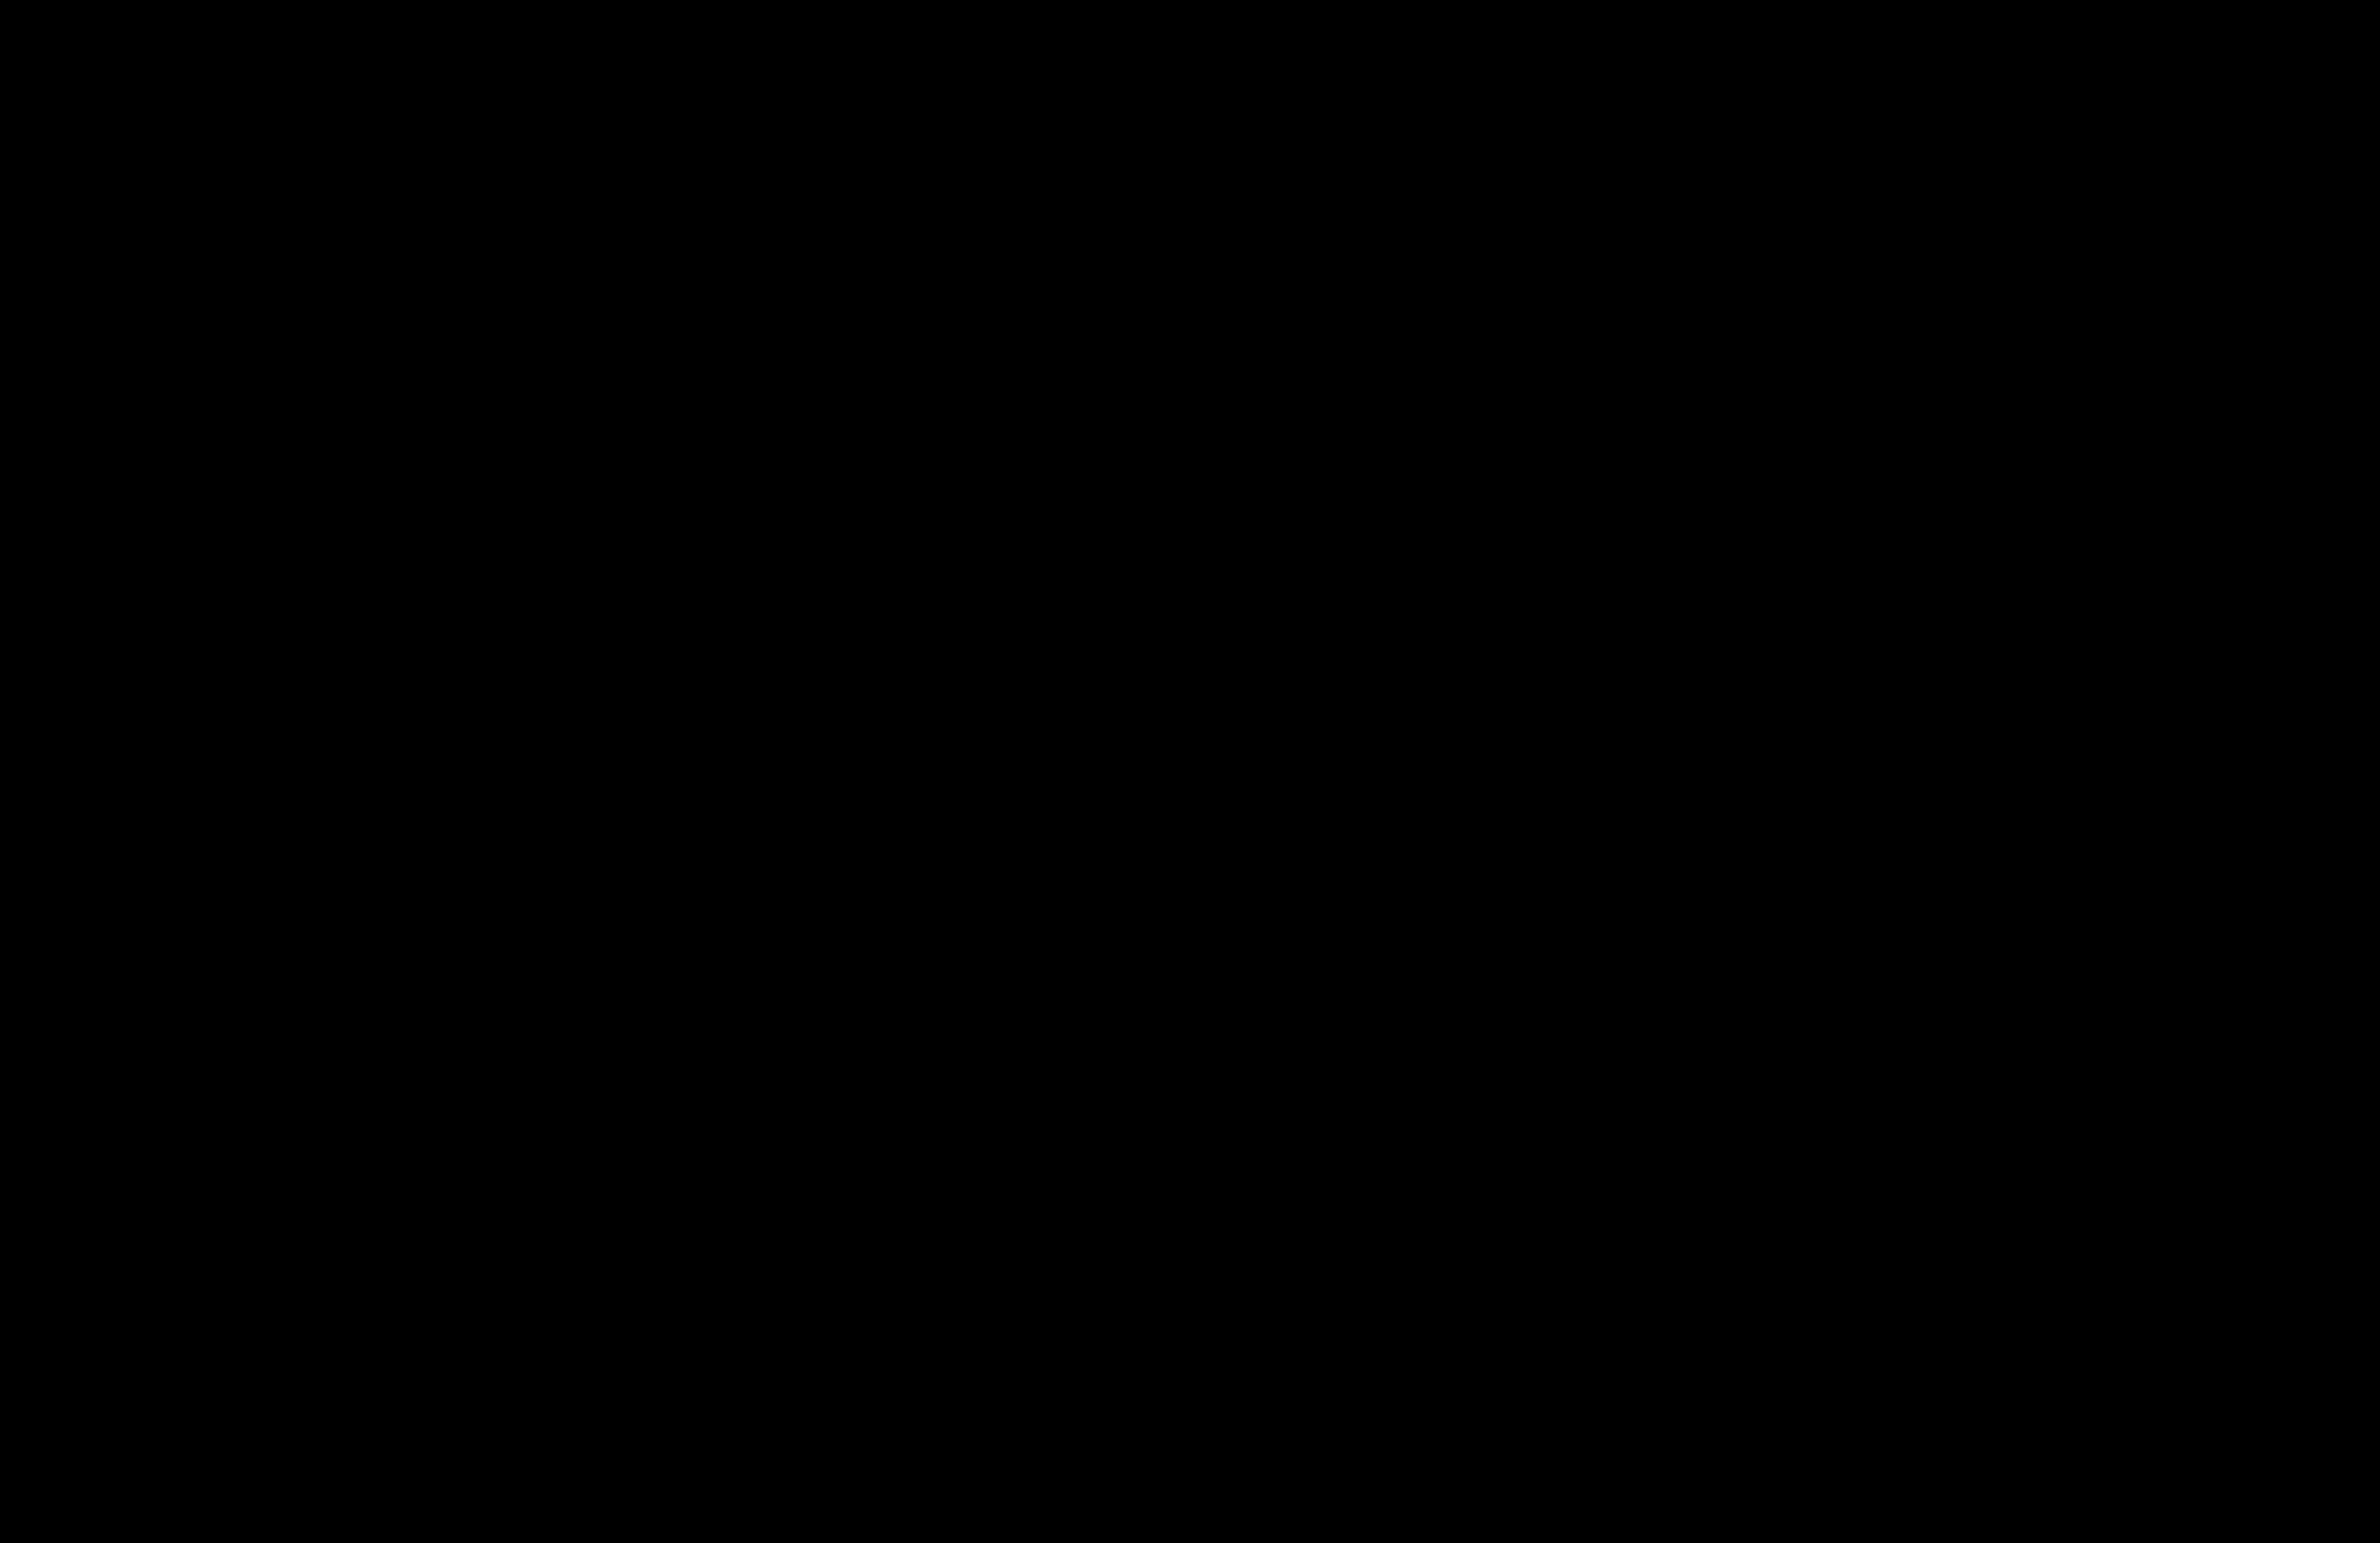 Clipart - Community garden icon